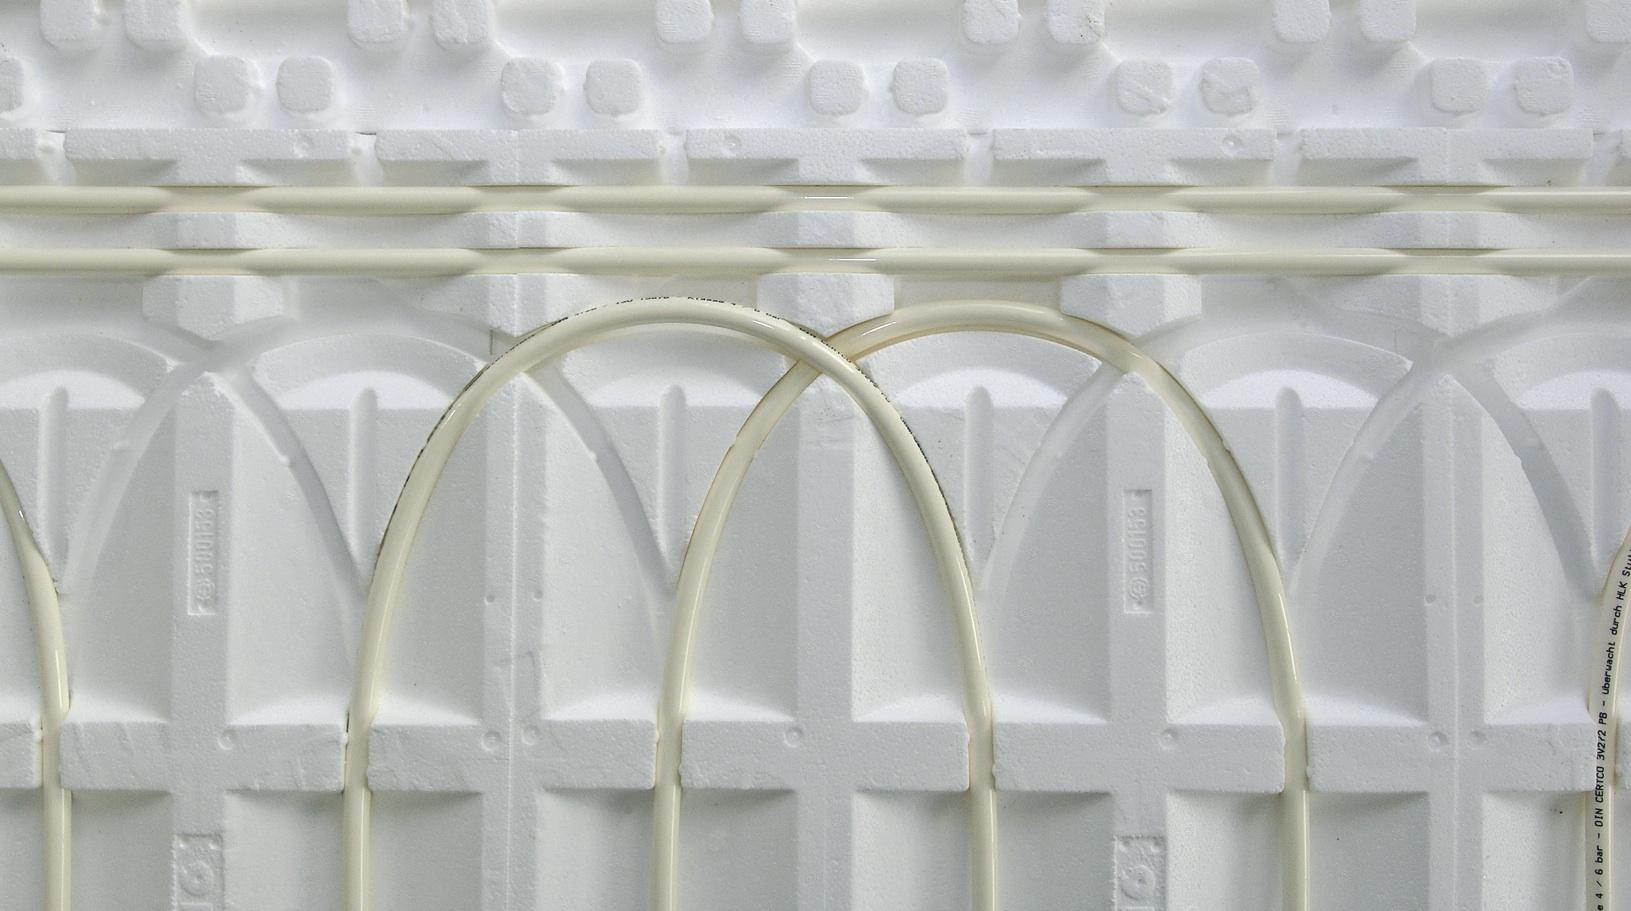 Briotherm Vloerverwarming - Nova Systeem